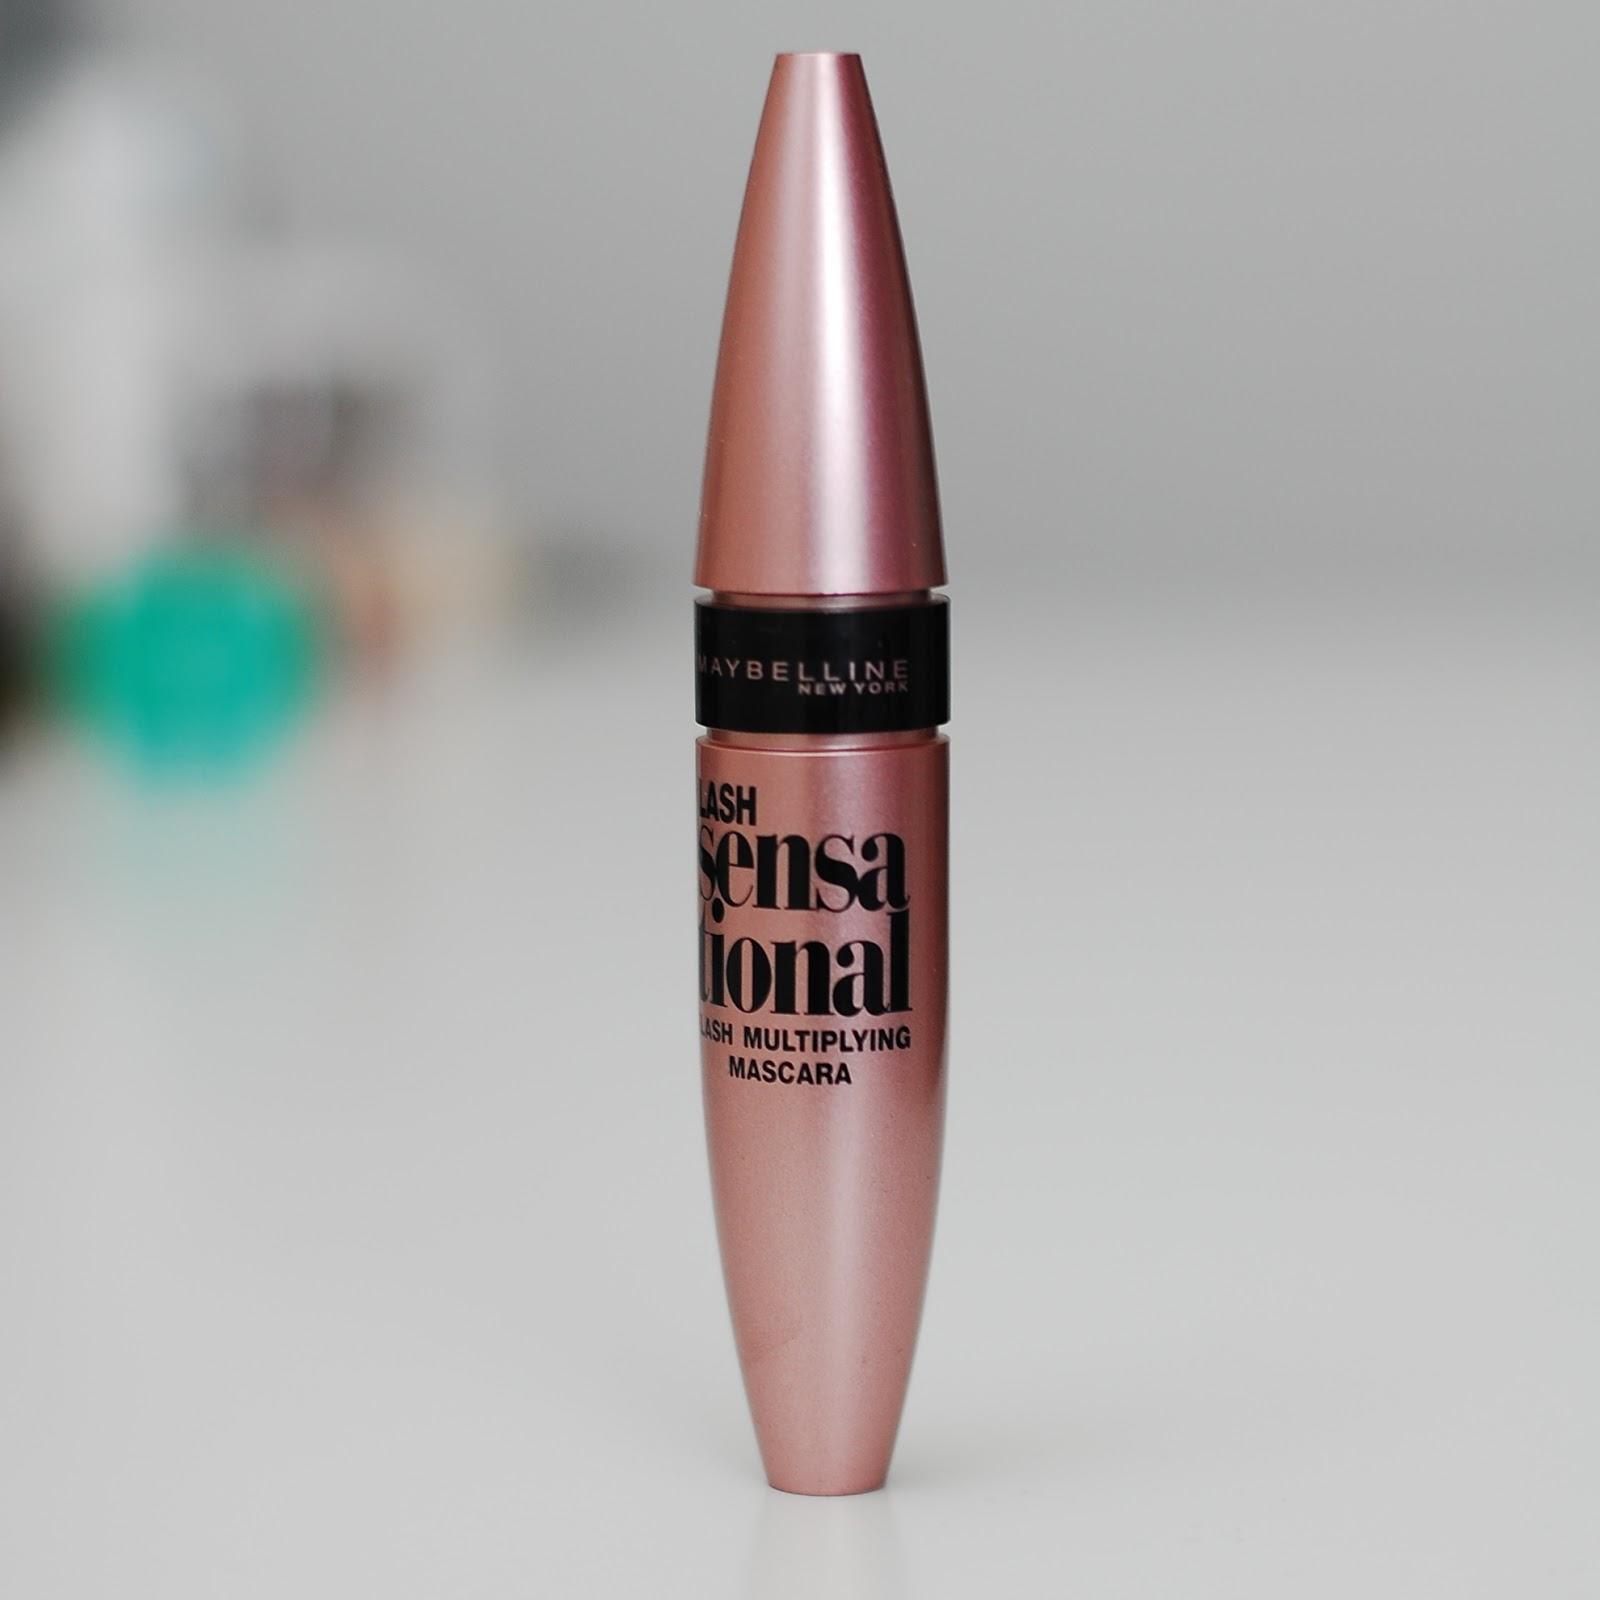 e172f16b8bd addicted to cosmetics / blog kosmetyczny: Maybelline Lash ...